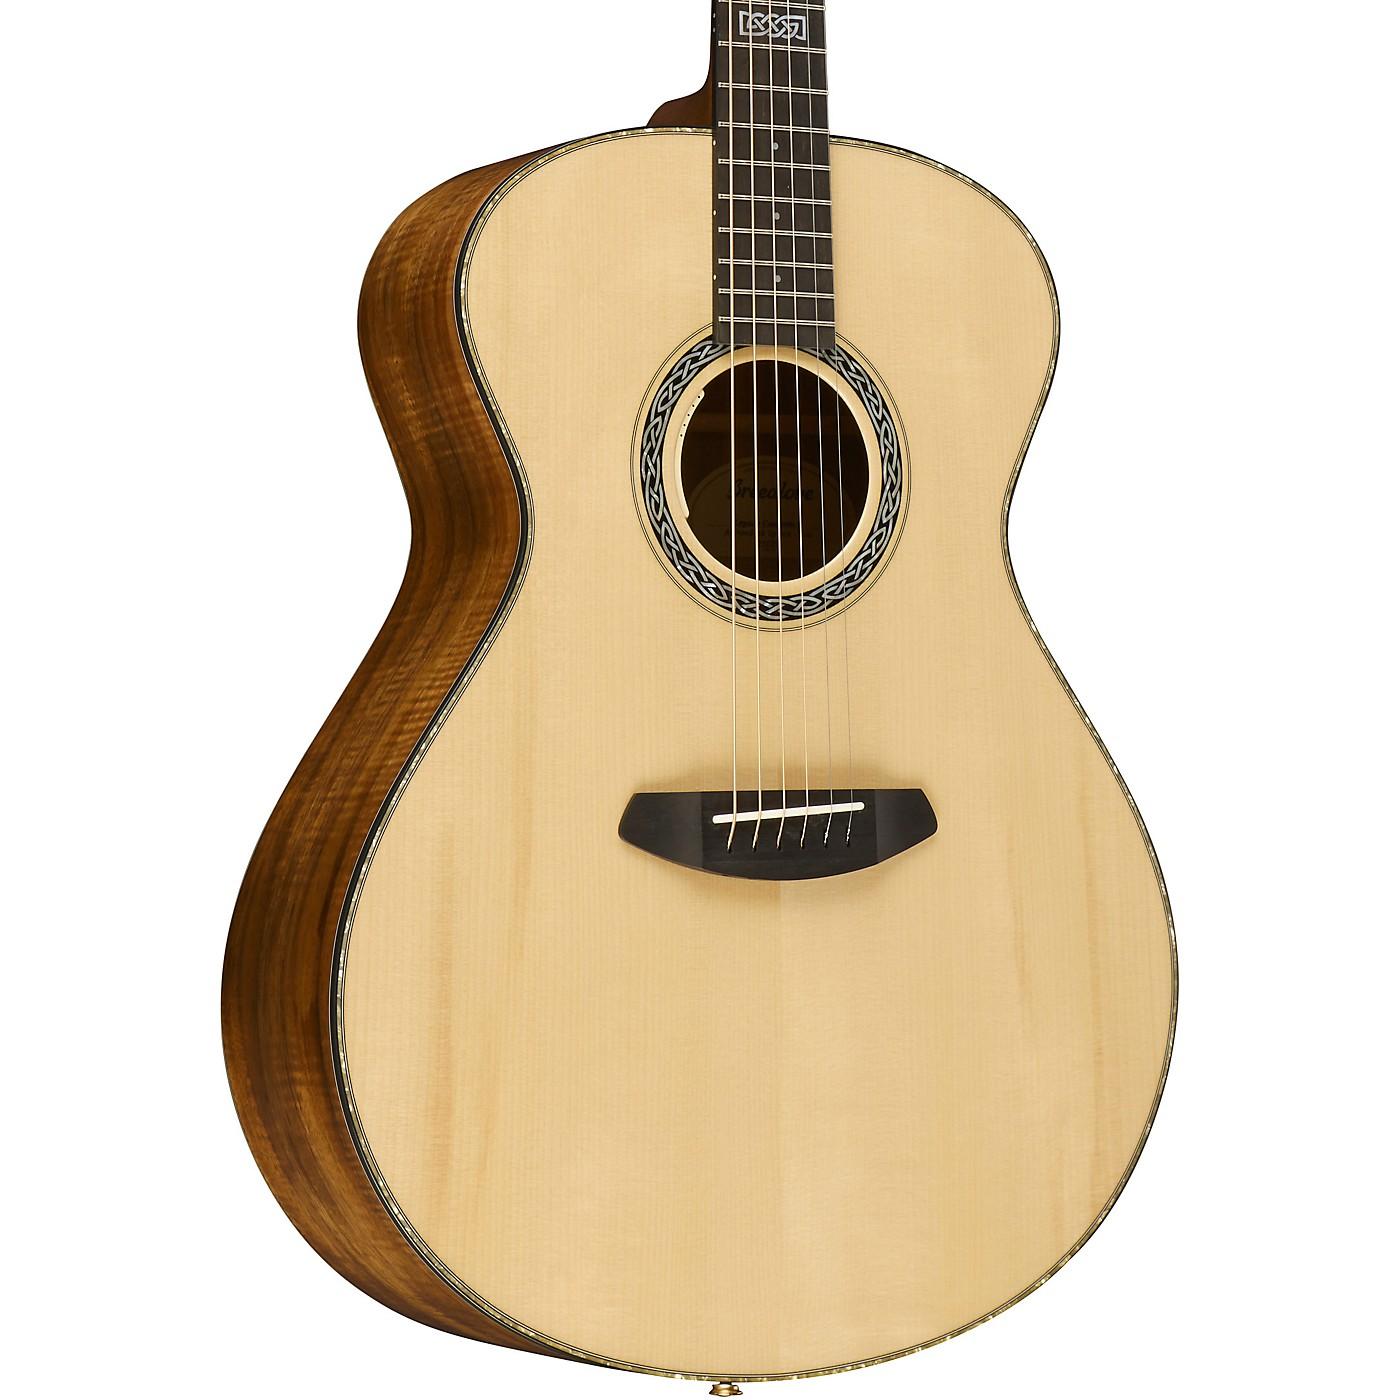 Breedlove Legacy Concerto E Adirondack Spruce - Koa Acoustic-Electric Guitar thumbnail